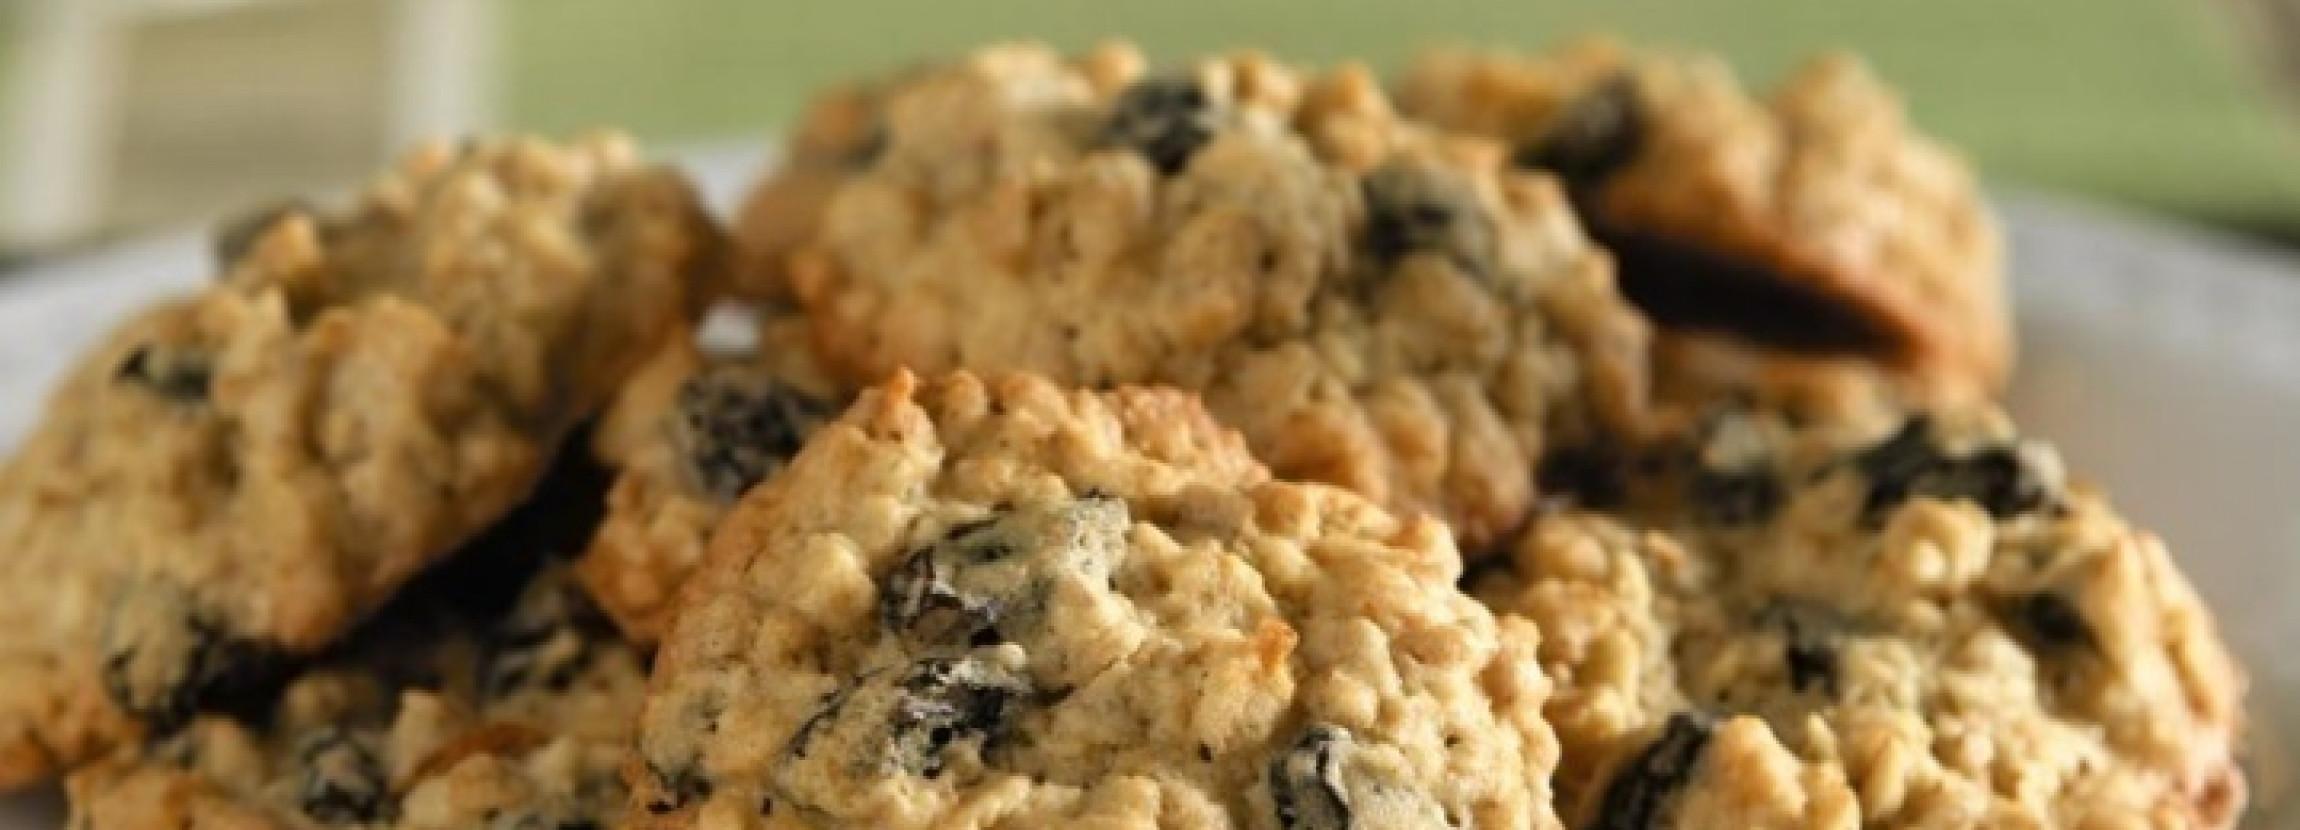 Diabetic Oatmeal Cookies With Splenda  diabetic oatmeal cookies with splenda